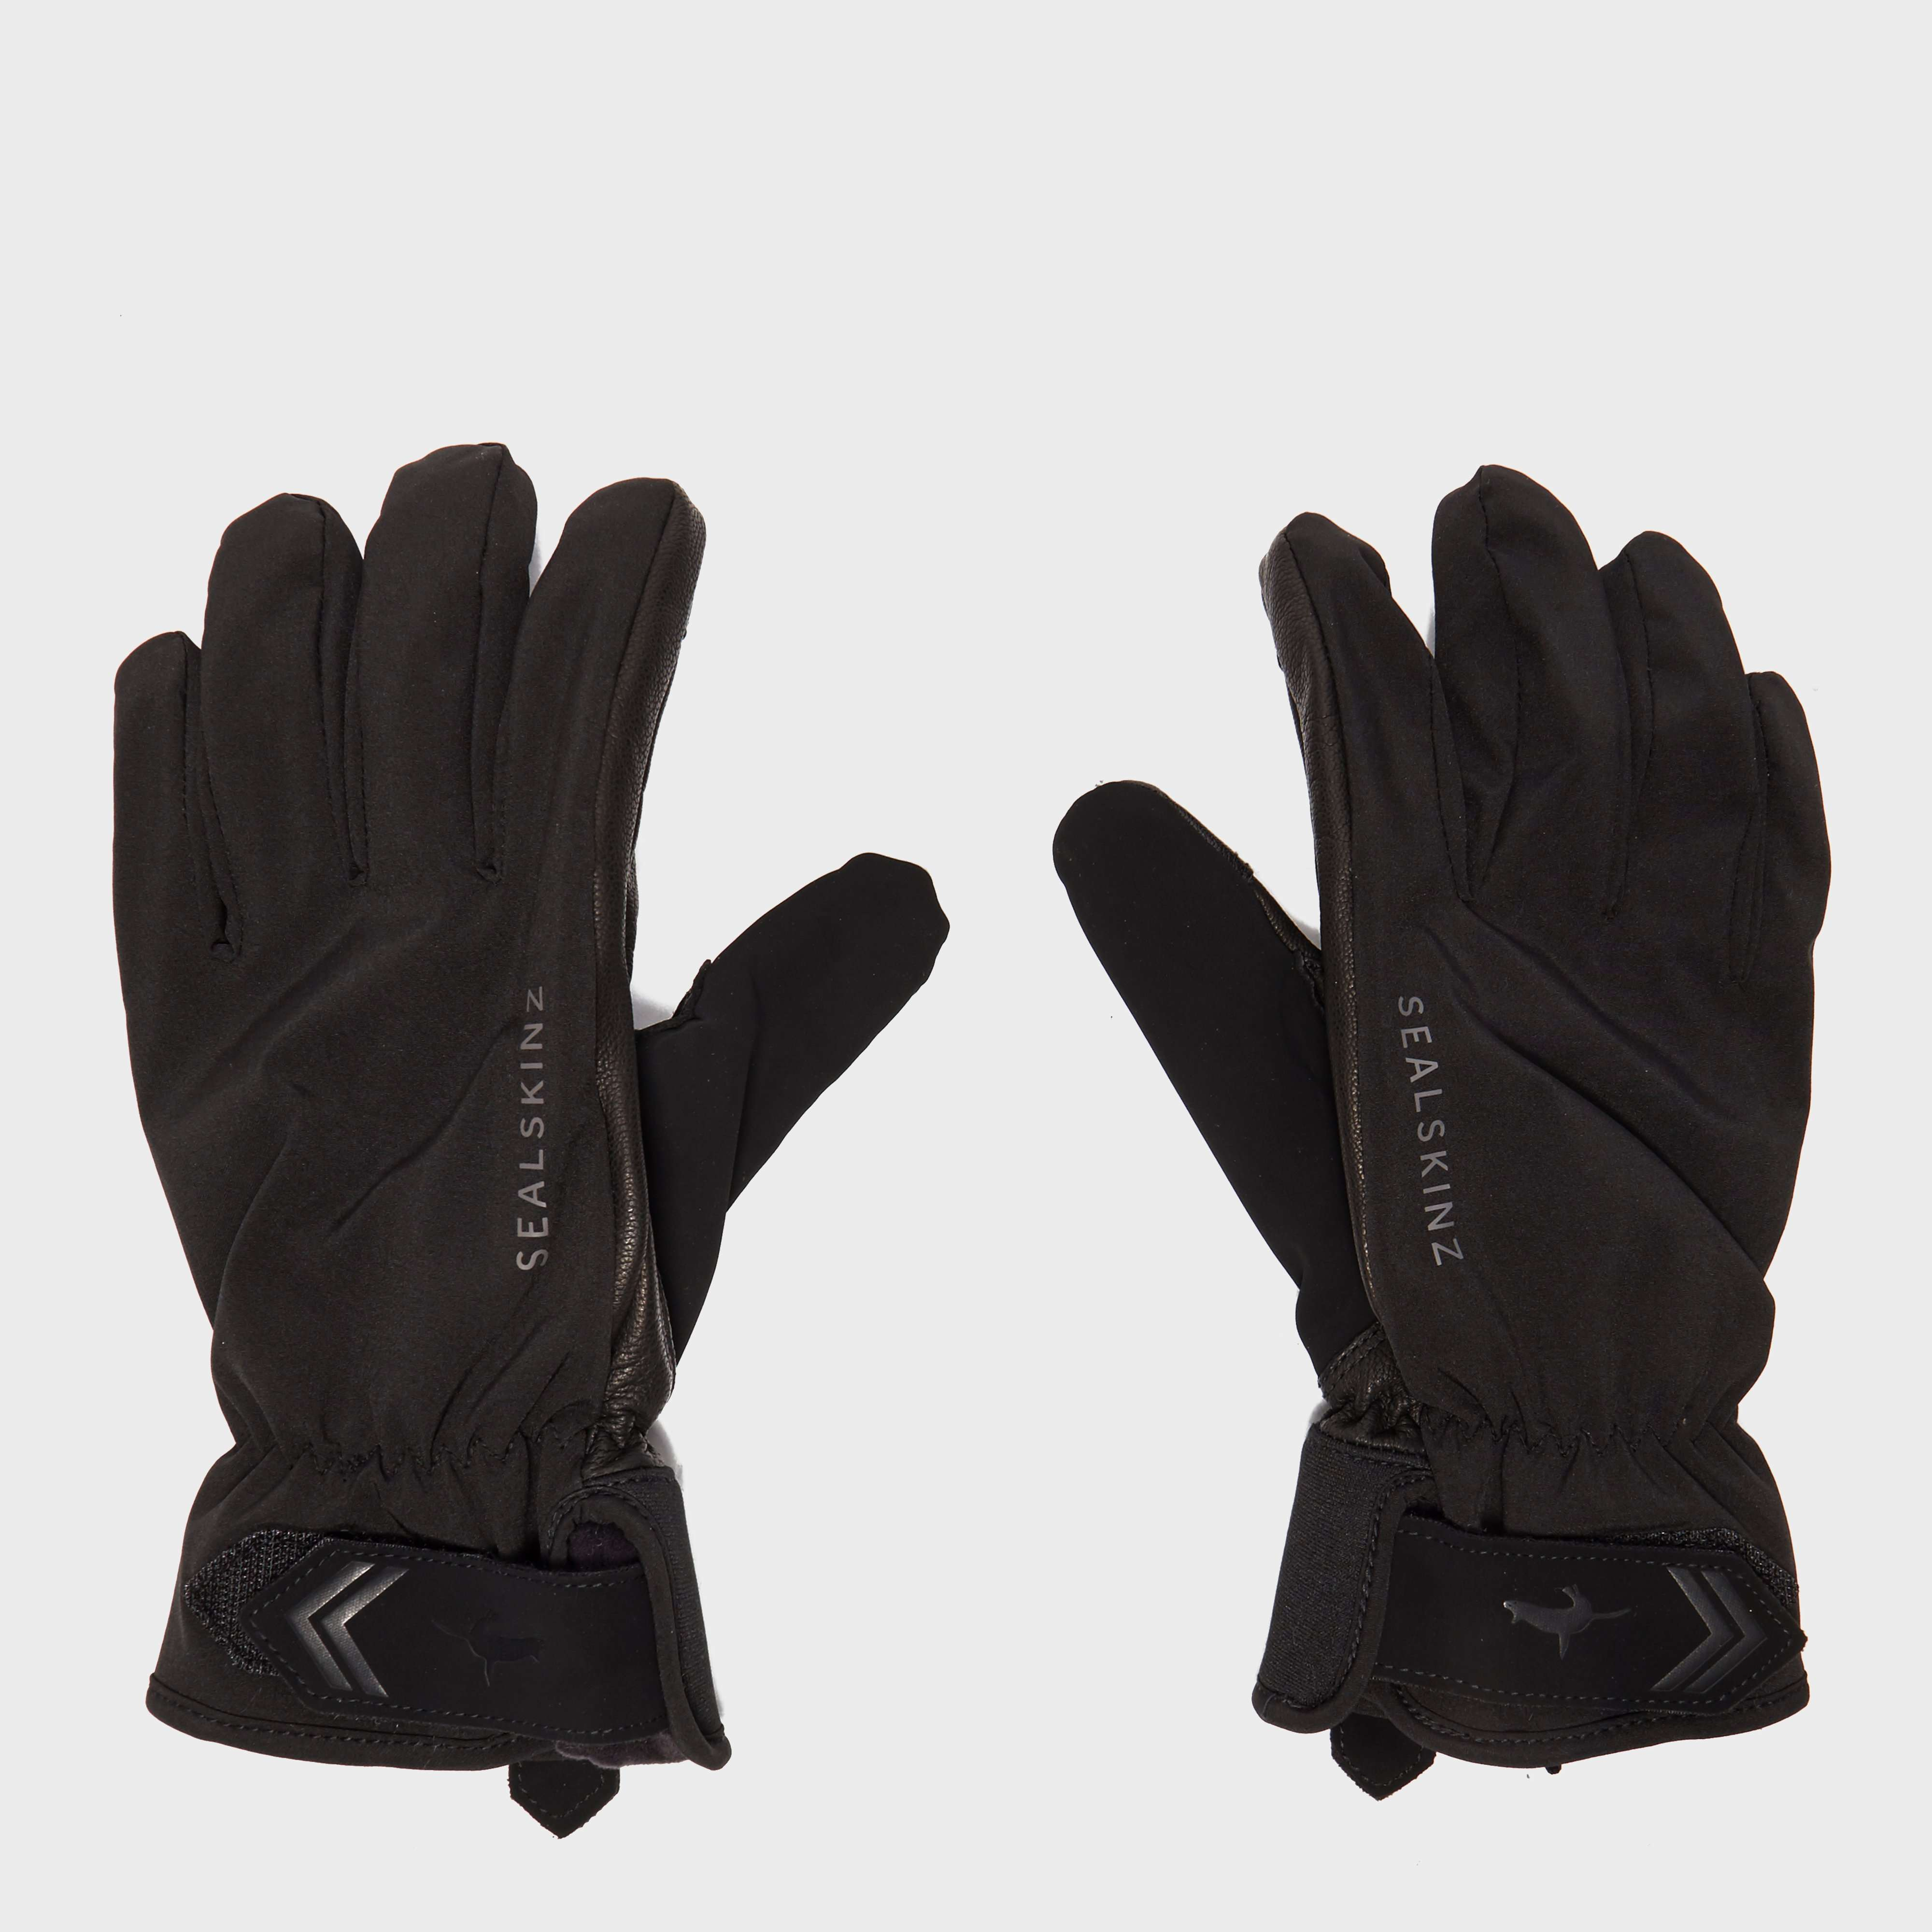 SEALSKINZ Men's All Season Gloves